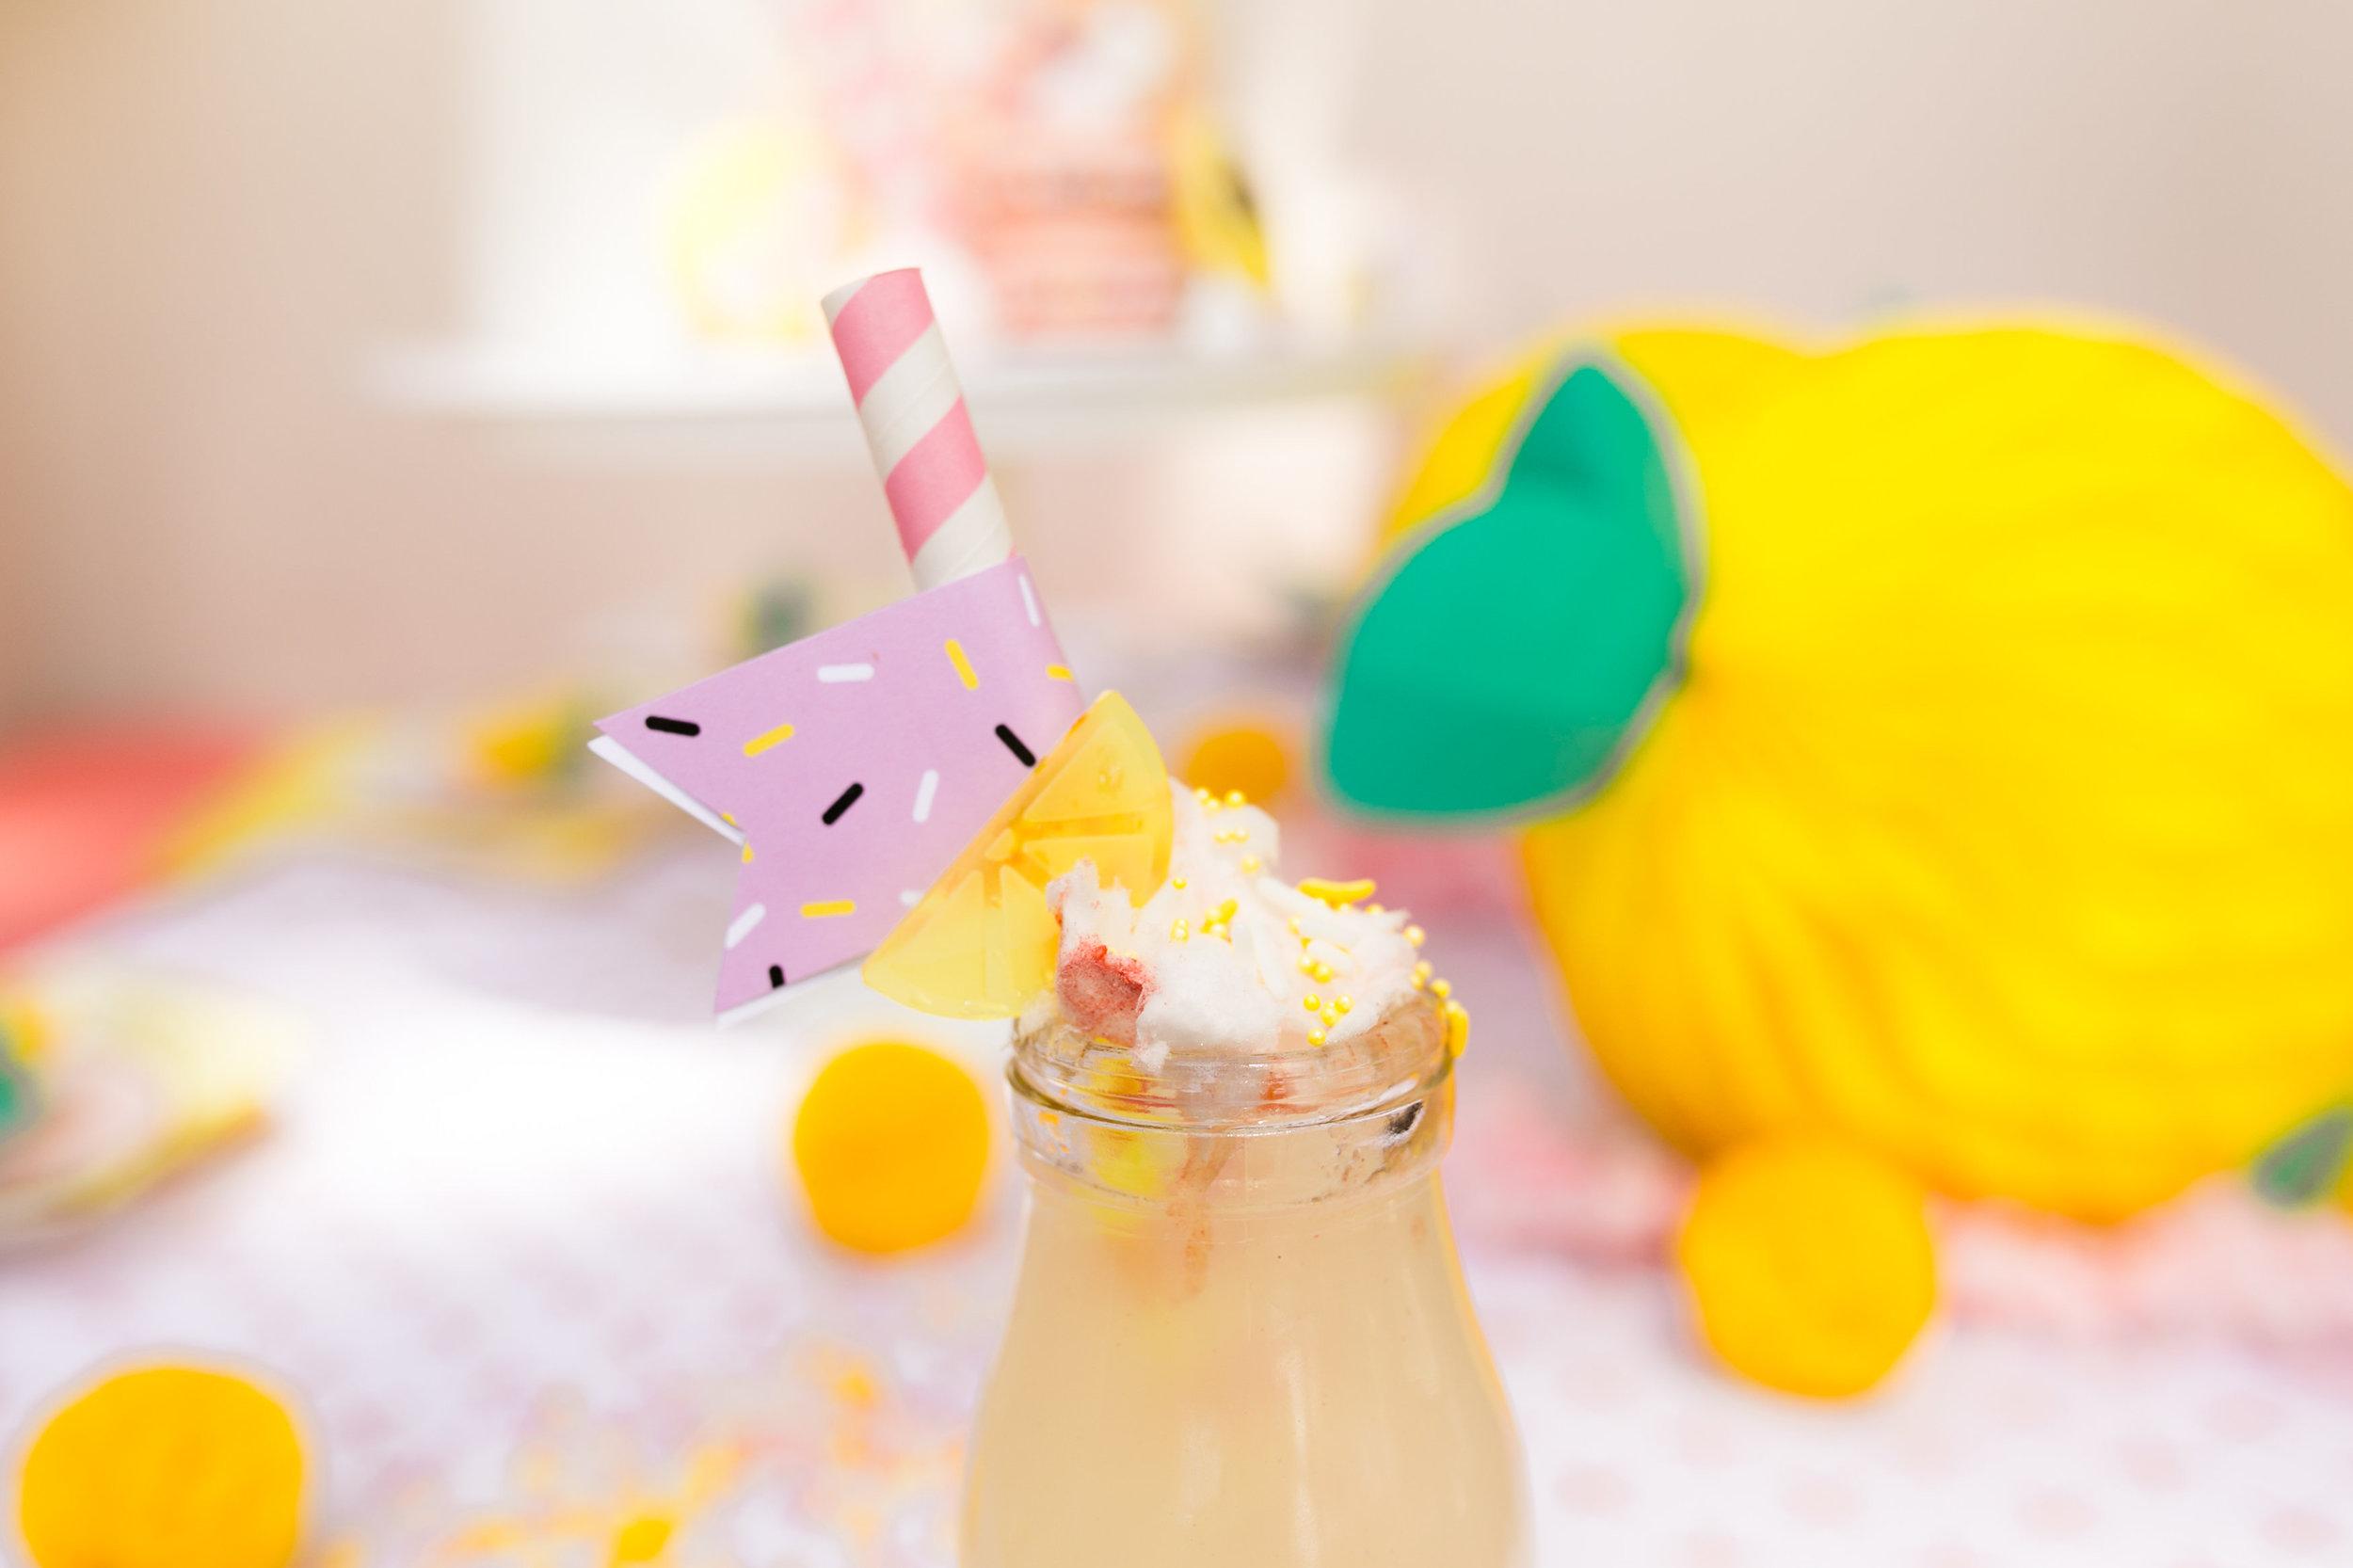 Lemonade Kids Birthday Party Table Decor - lemonade drinks